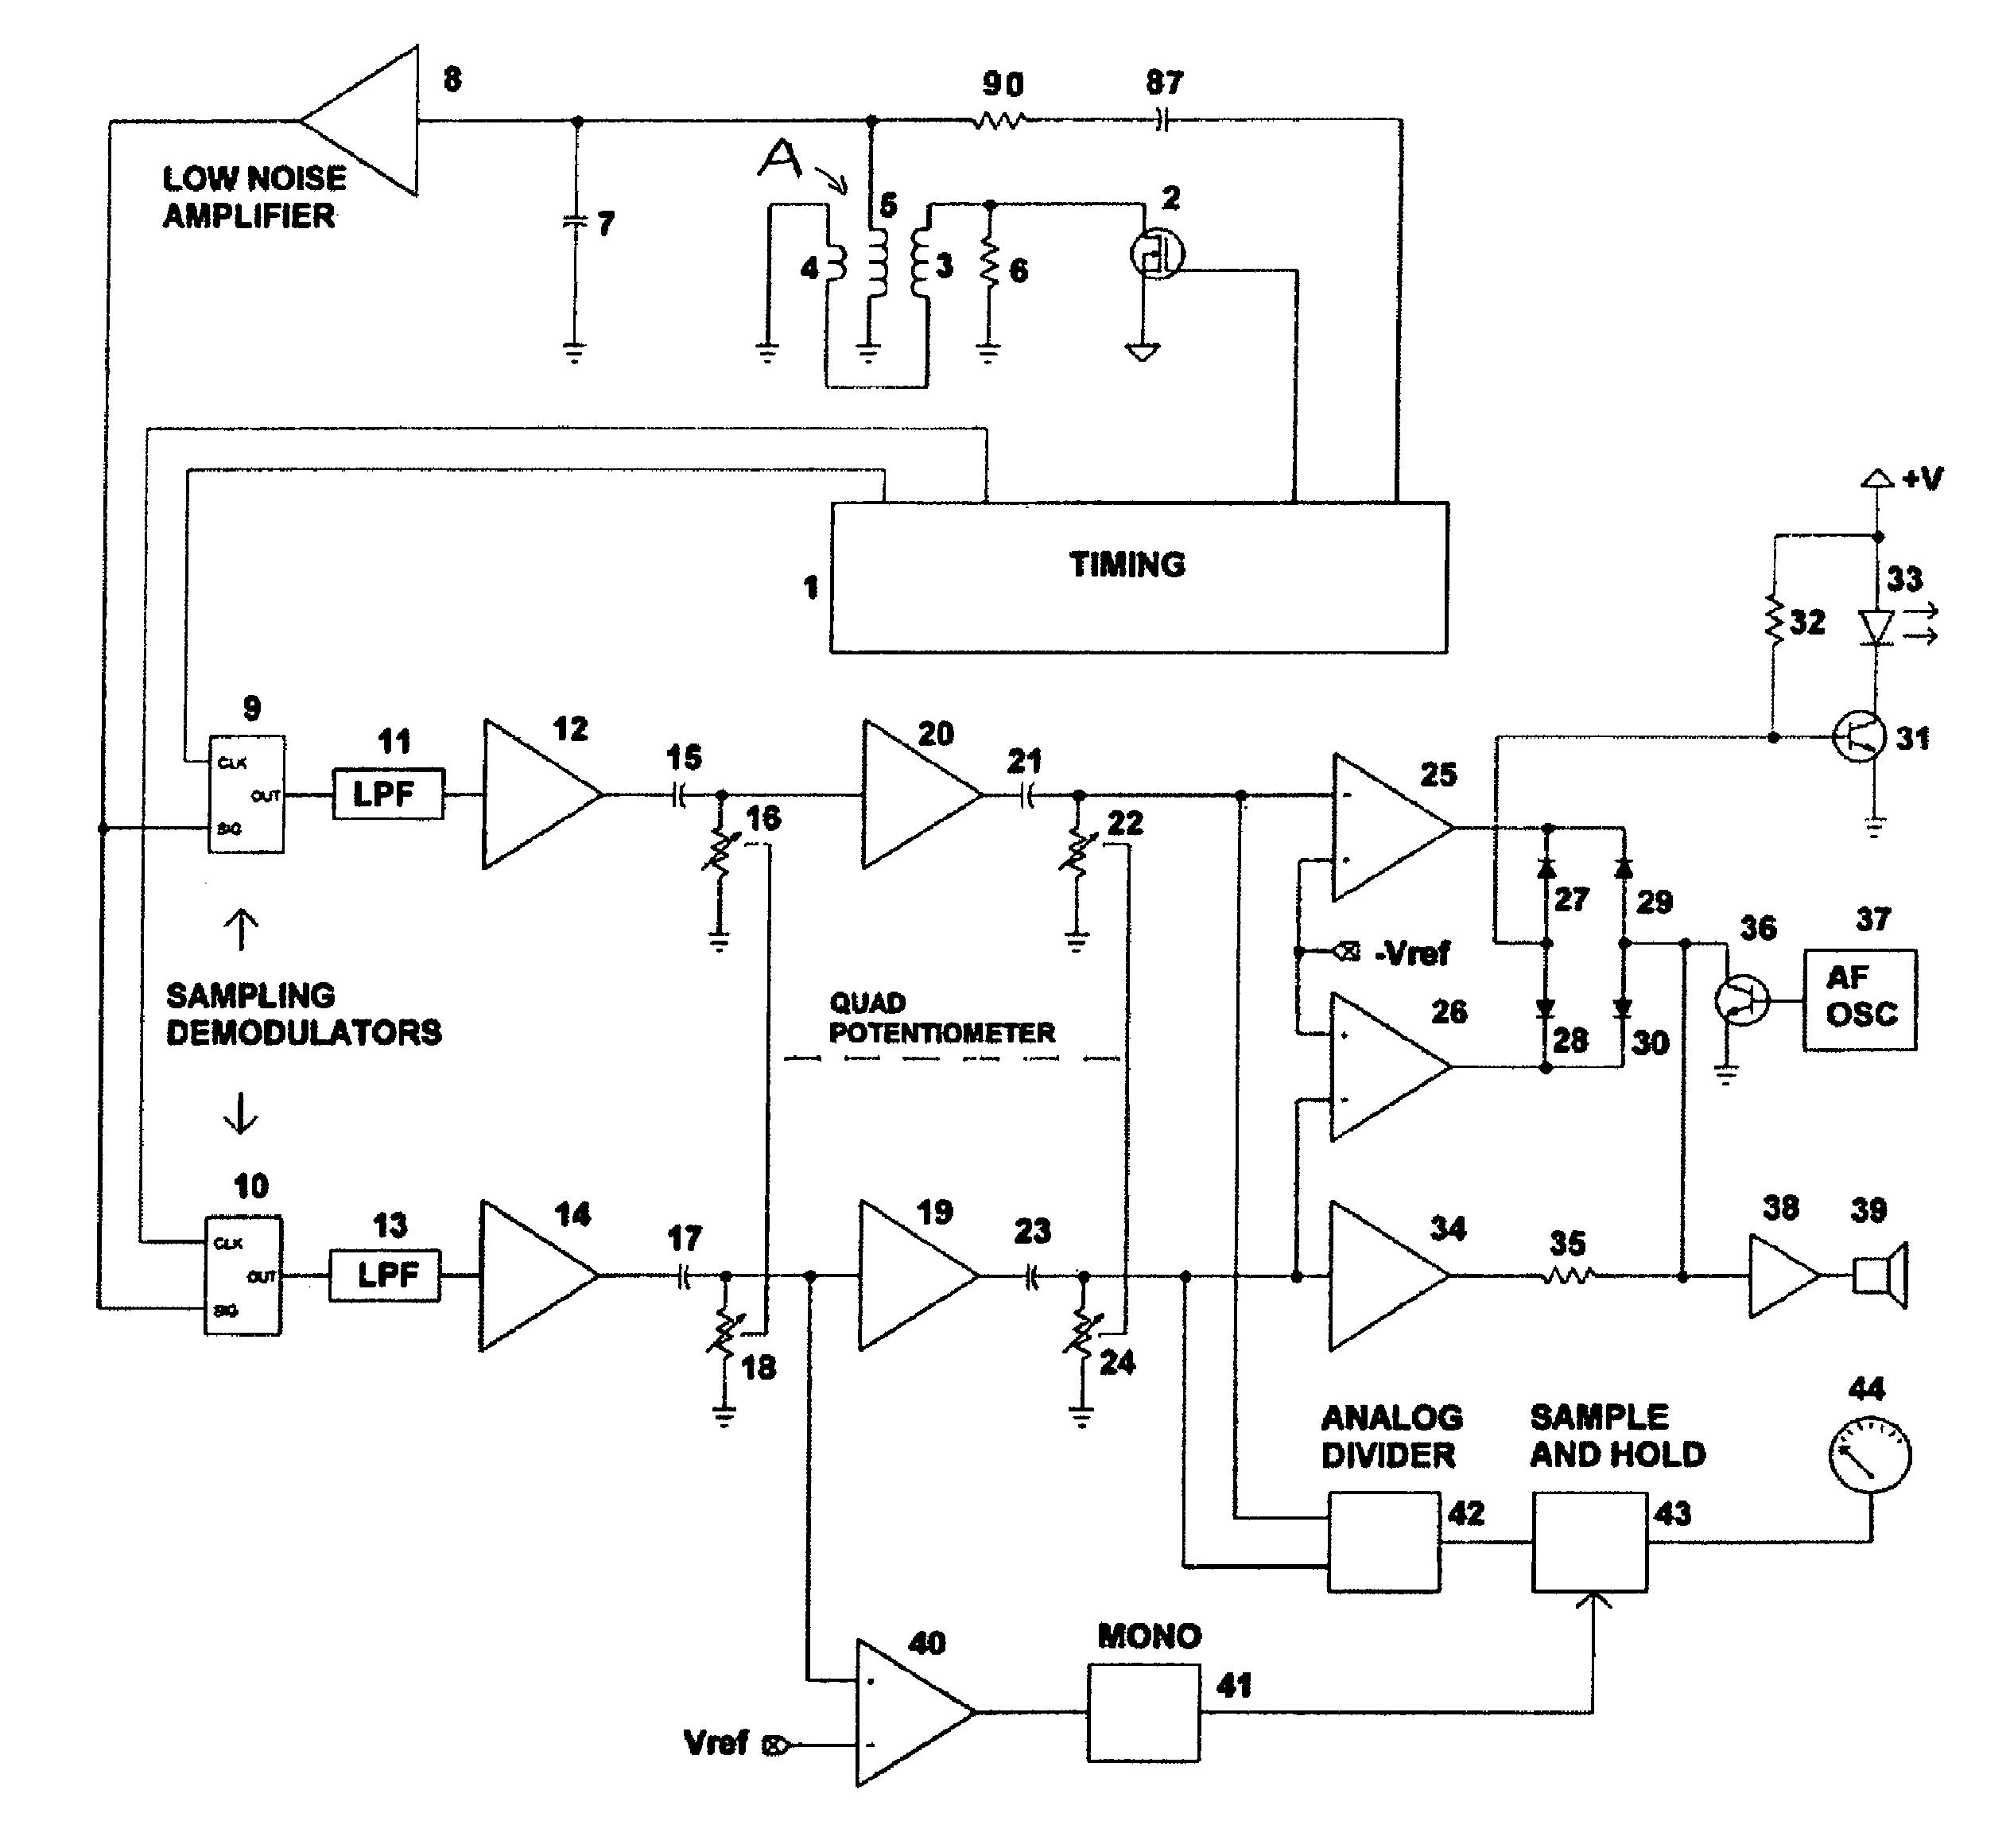 Metal Detector Coil Schematic Wiring Diagrams Pi Circuit Patent Us7710118 Resonant Pulse Induction Search Vintage Garrett Schematics